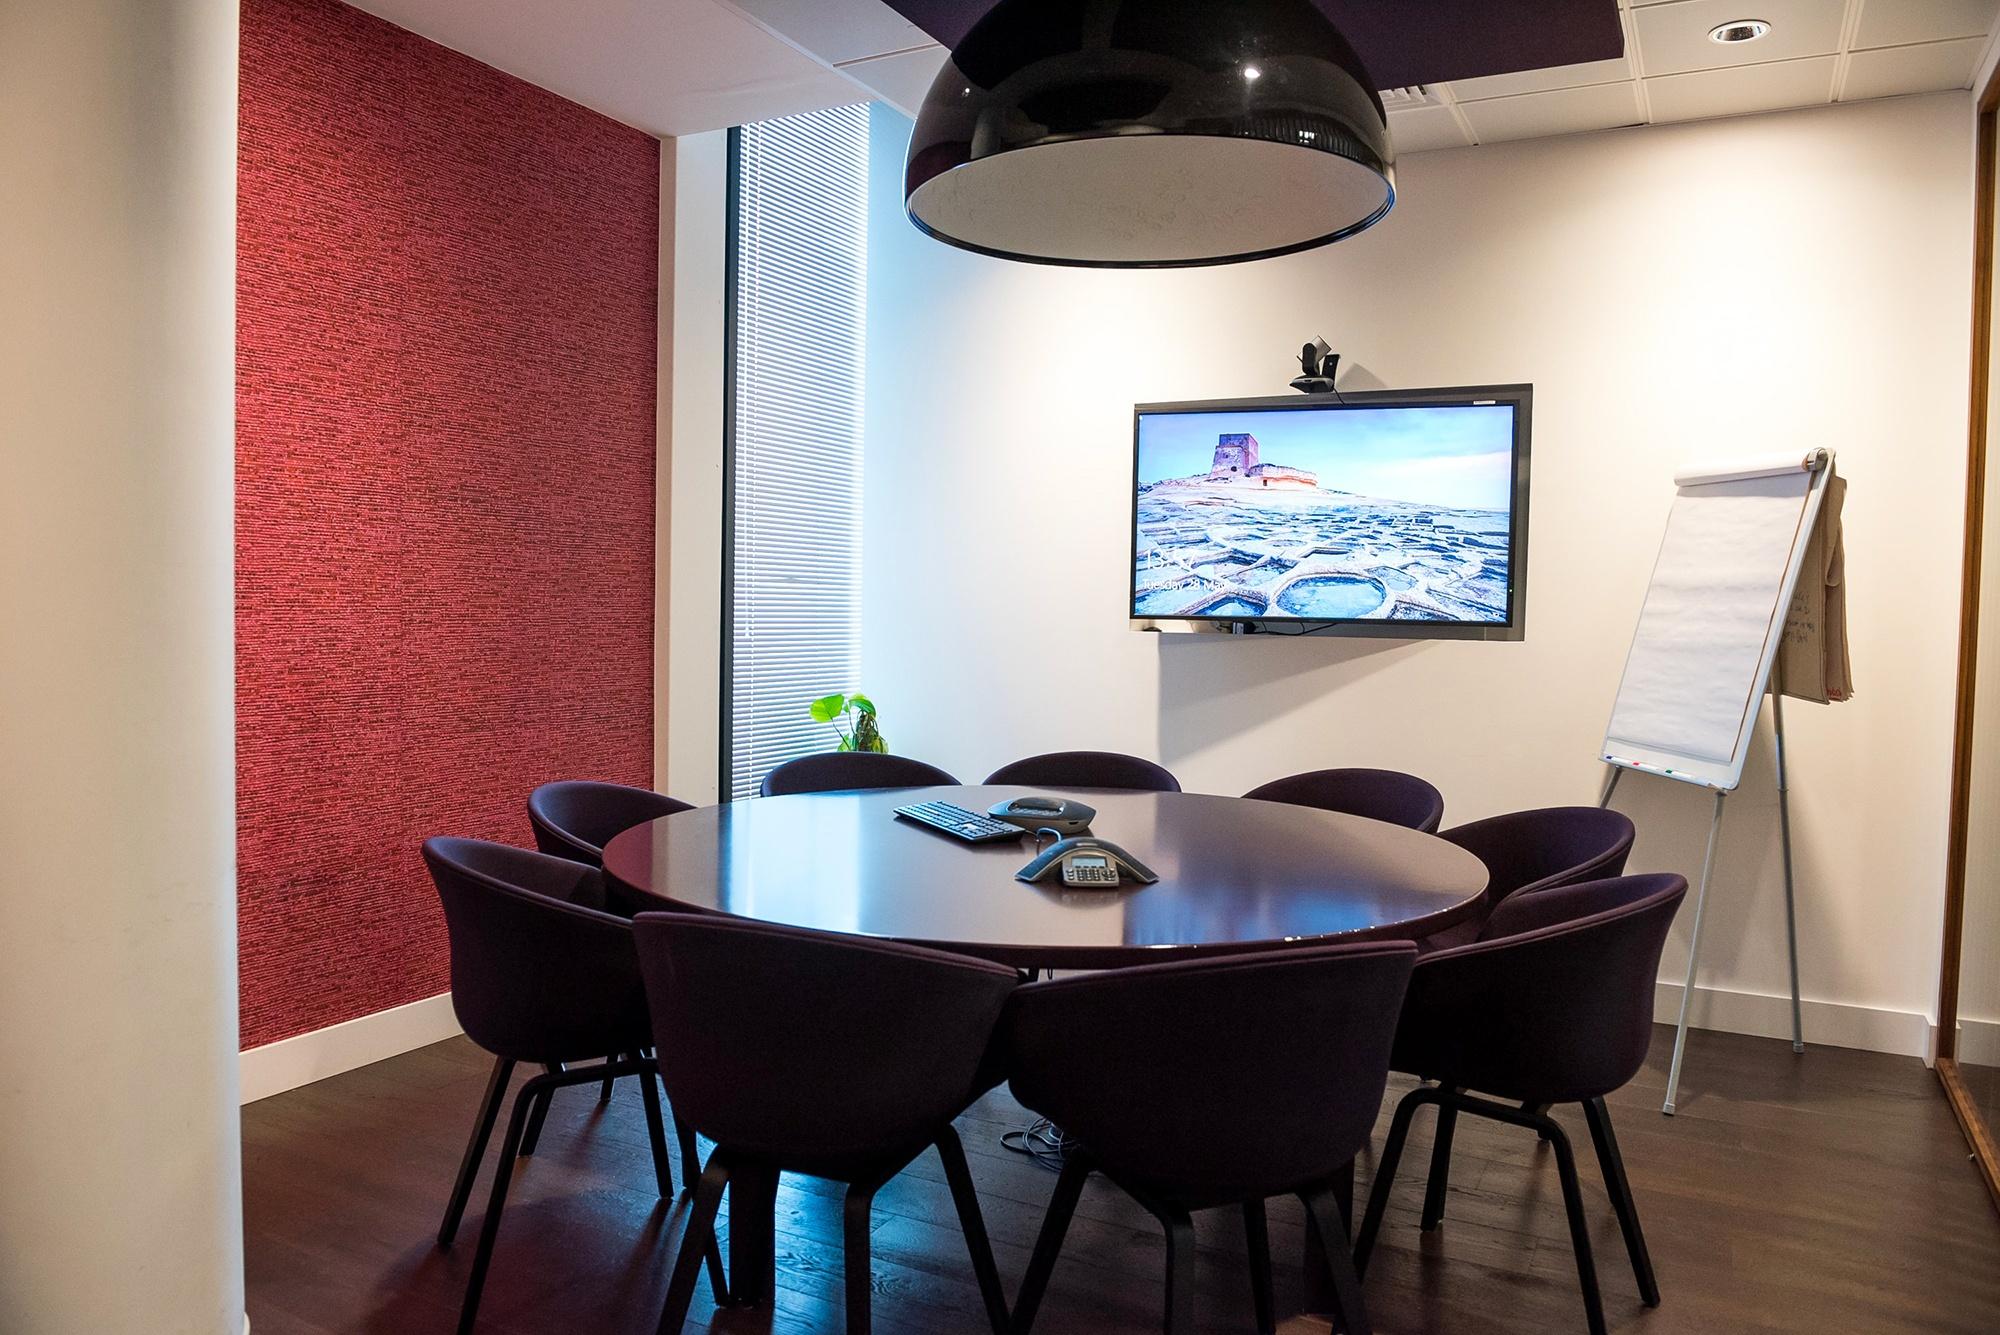 Installazione meeting room